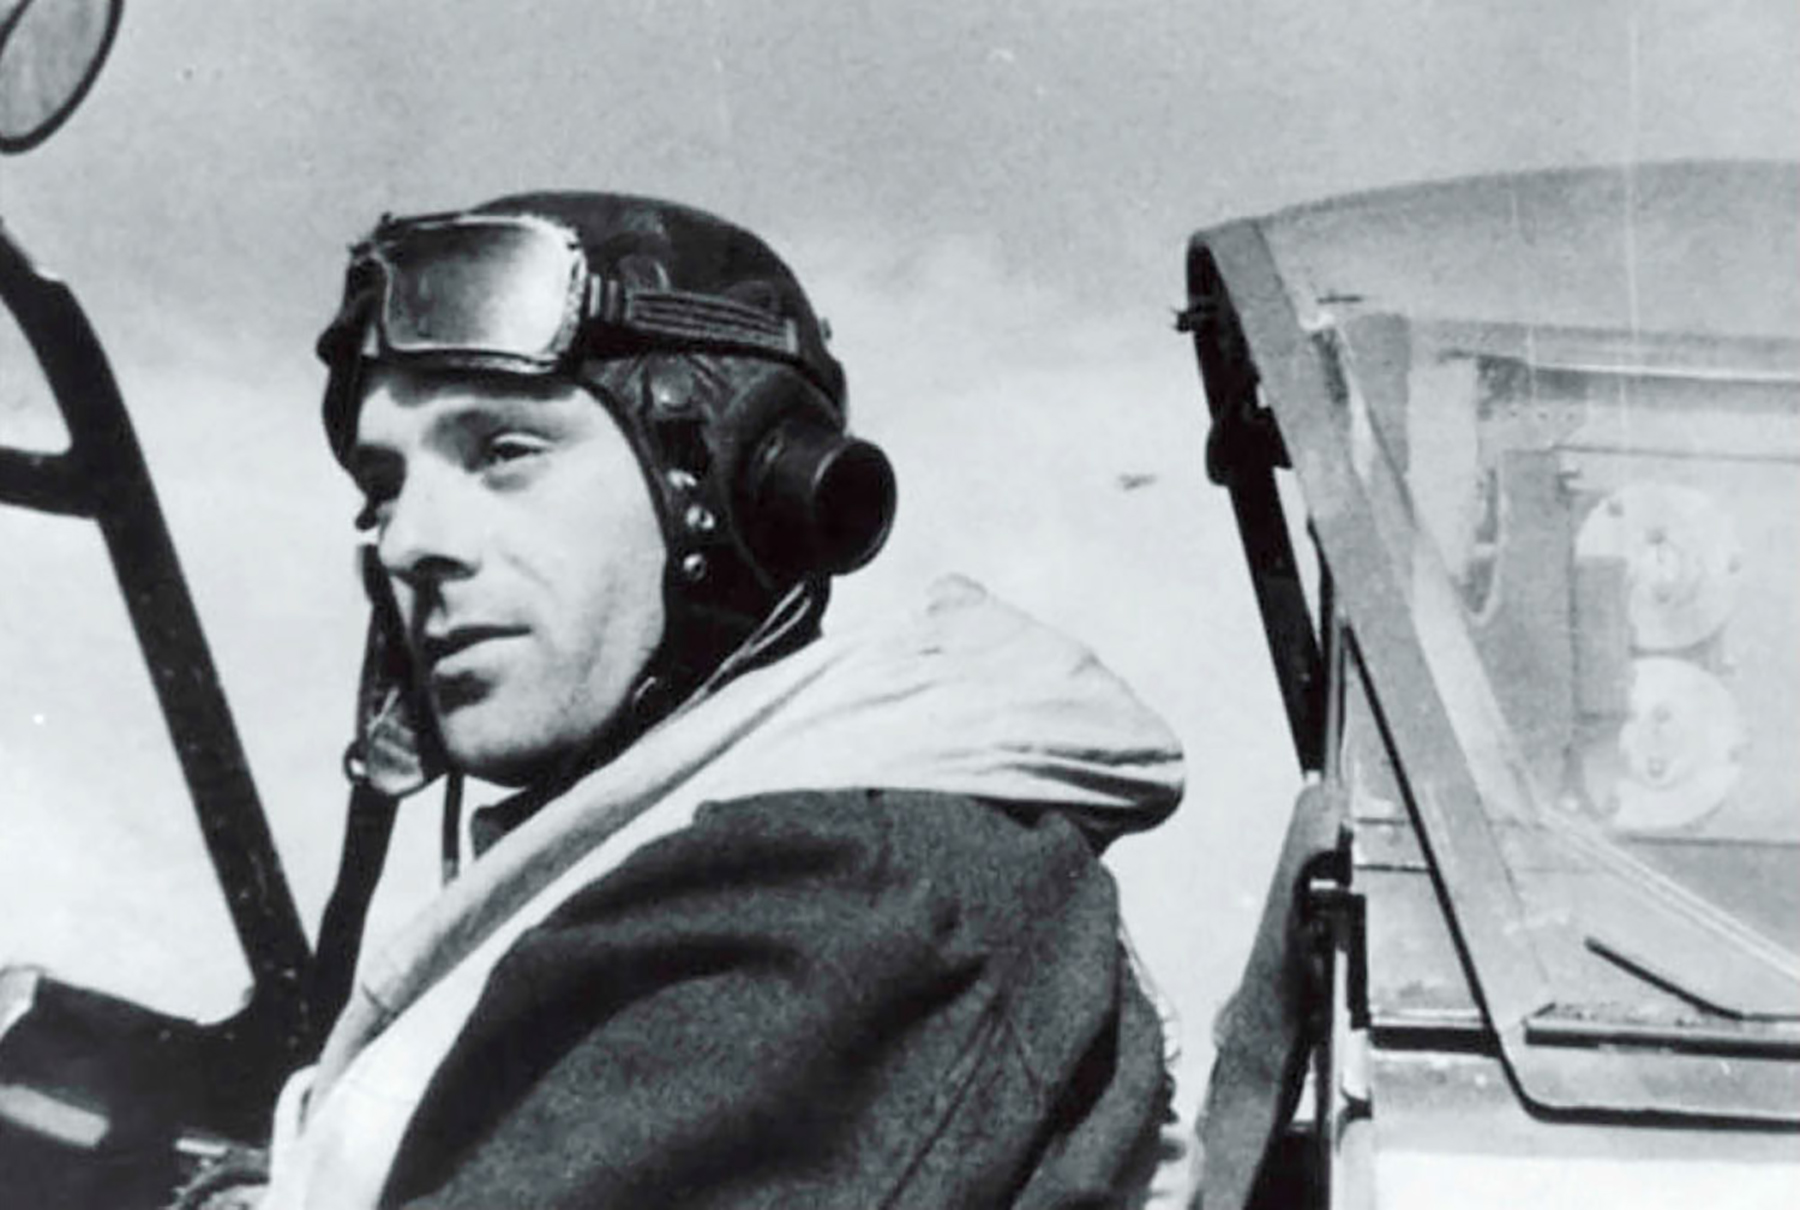 Aircrew RAF 312Sqn pilot FSgt Antonin Ocelka (Czechoslovakian) 1944 01